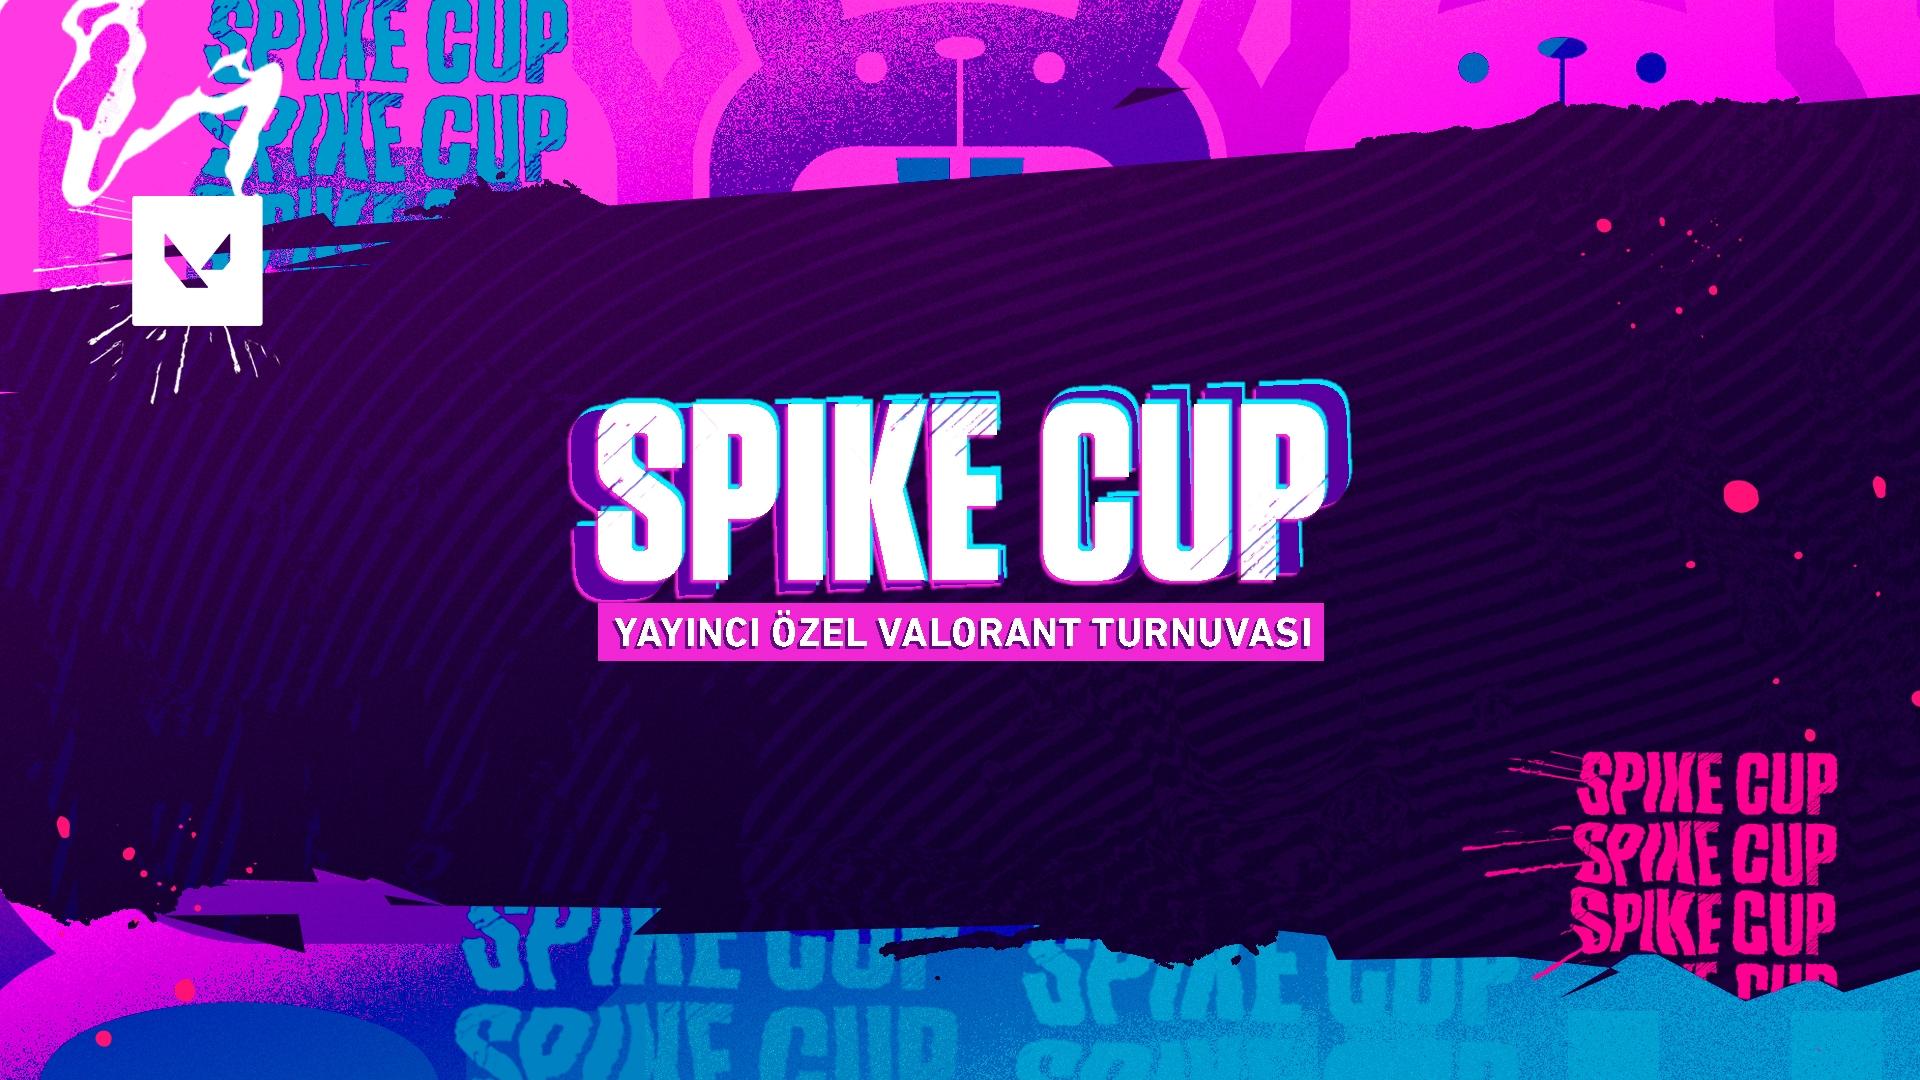 SPIKE_CUP_DUYURU_GÖRSELİ.jpg